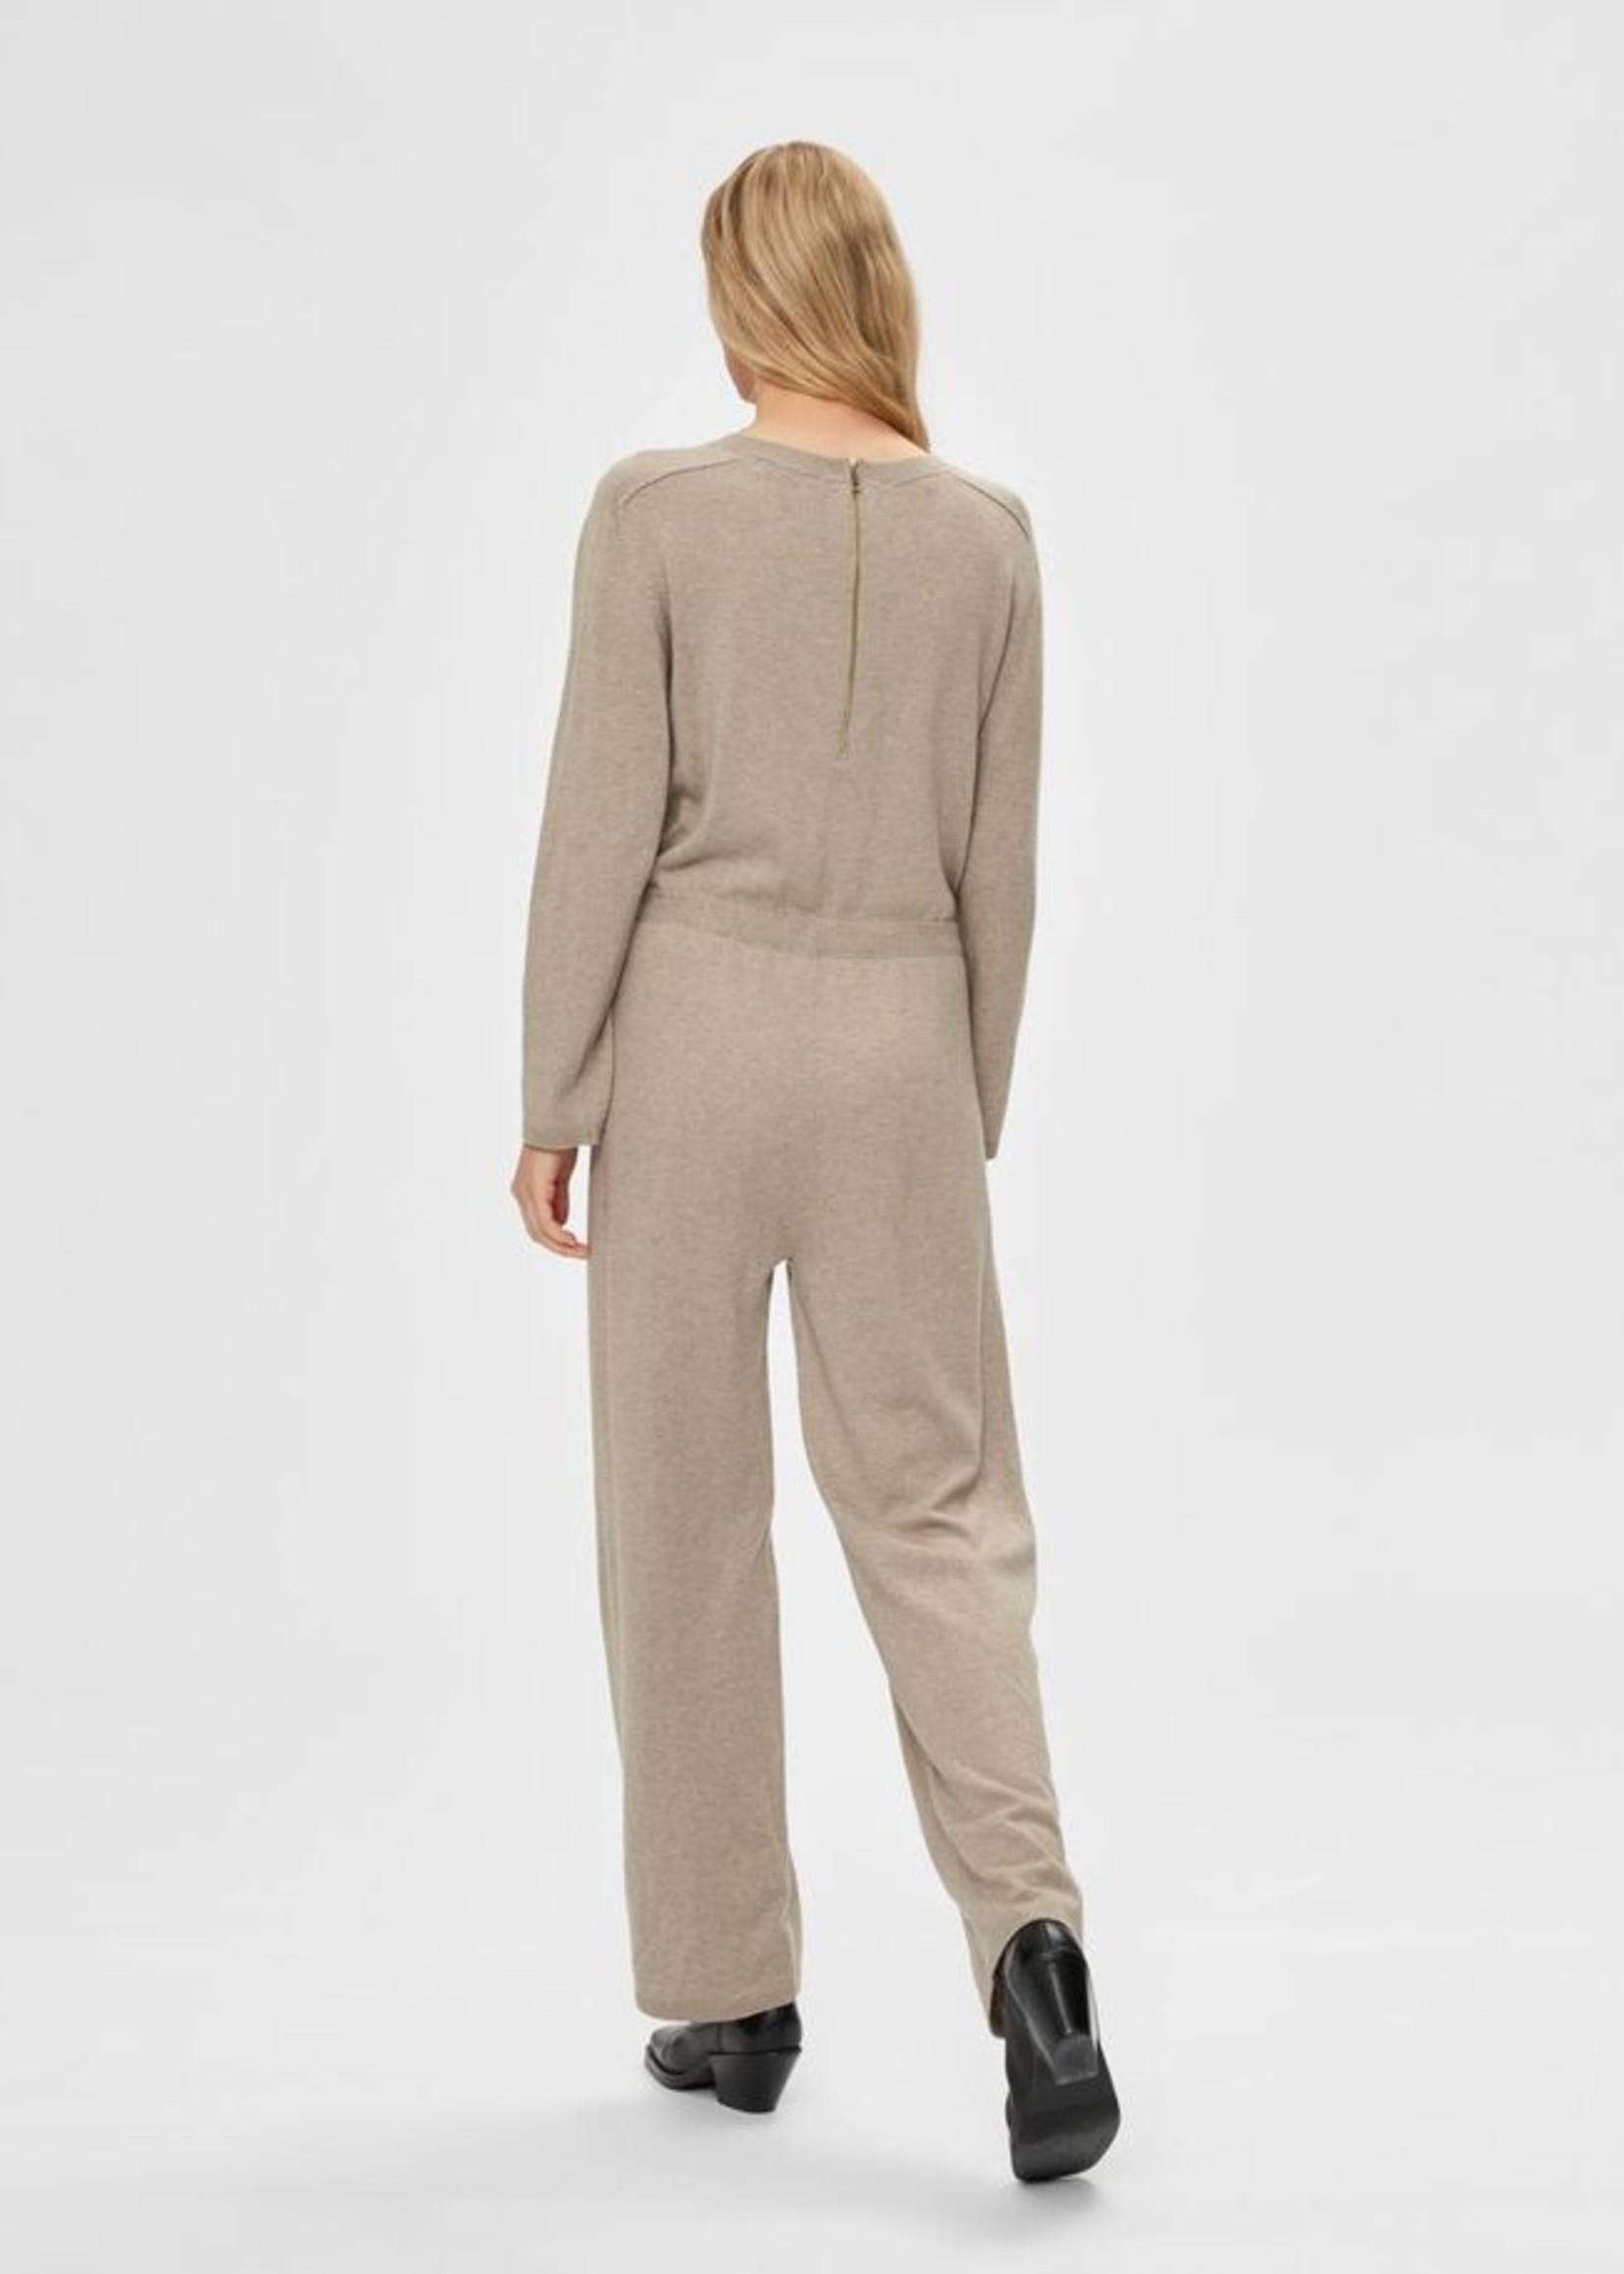 Selected Femme Inka cashmere knit jumpsuit